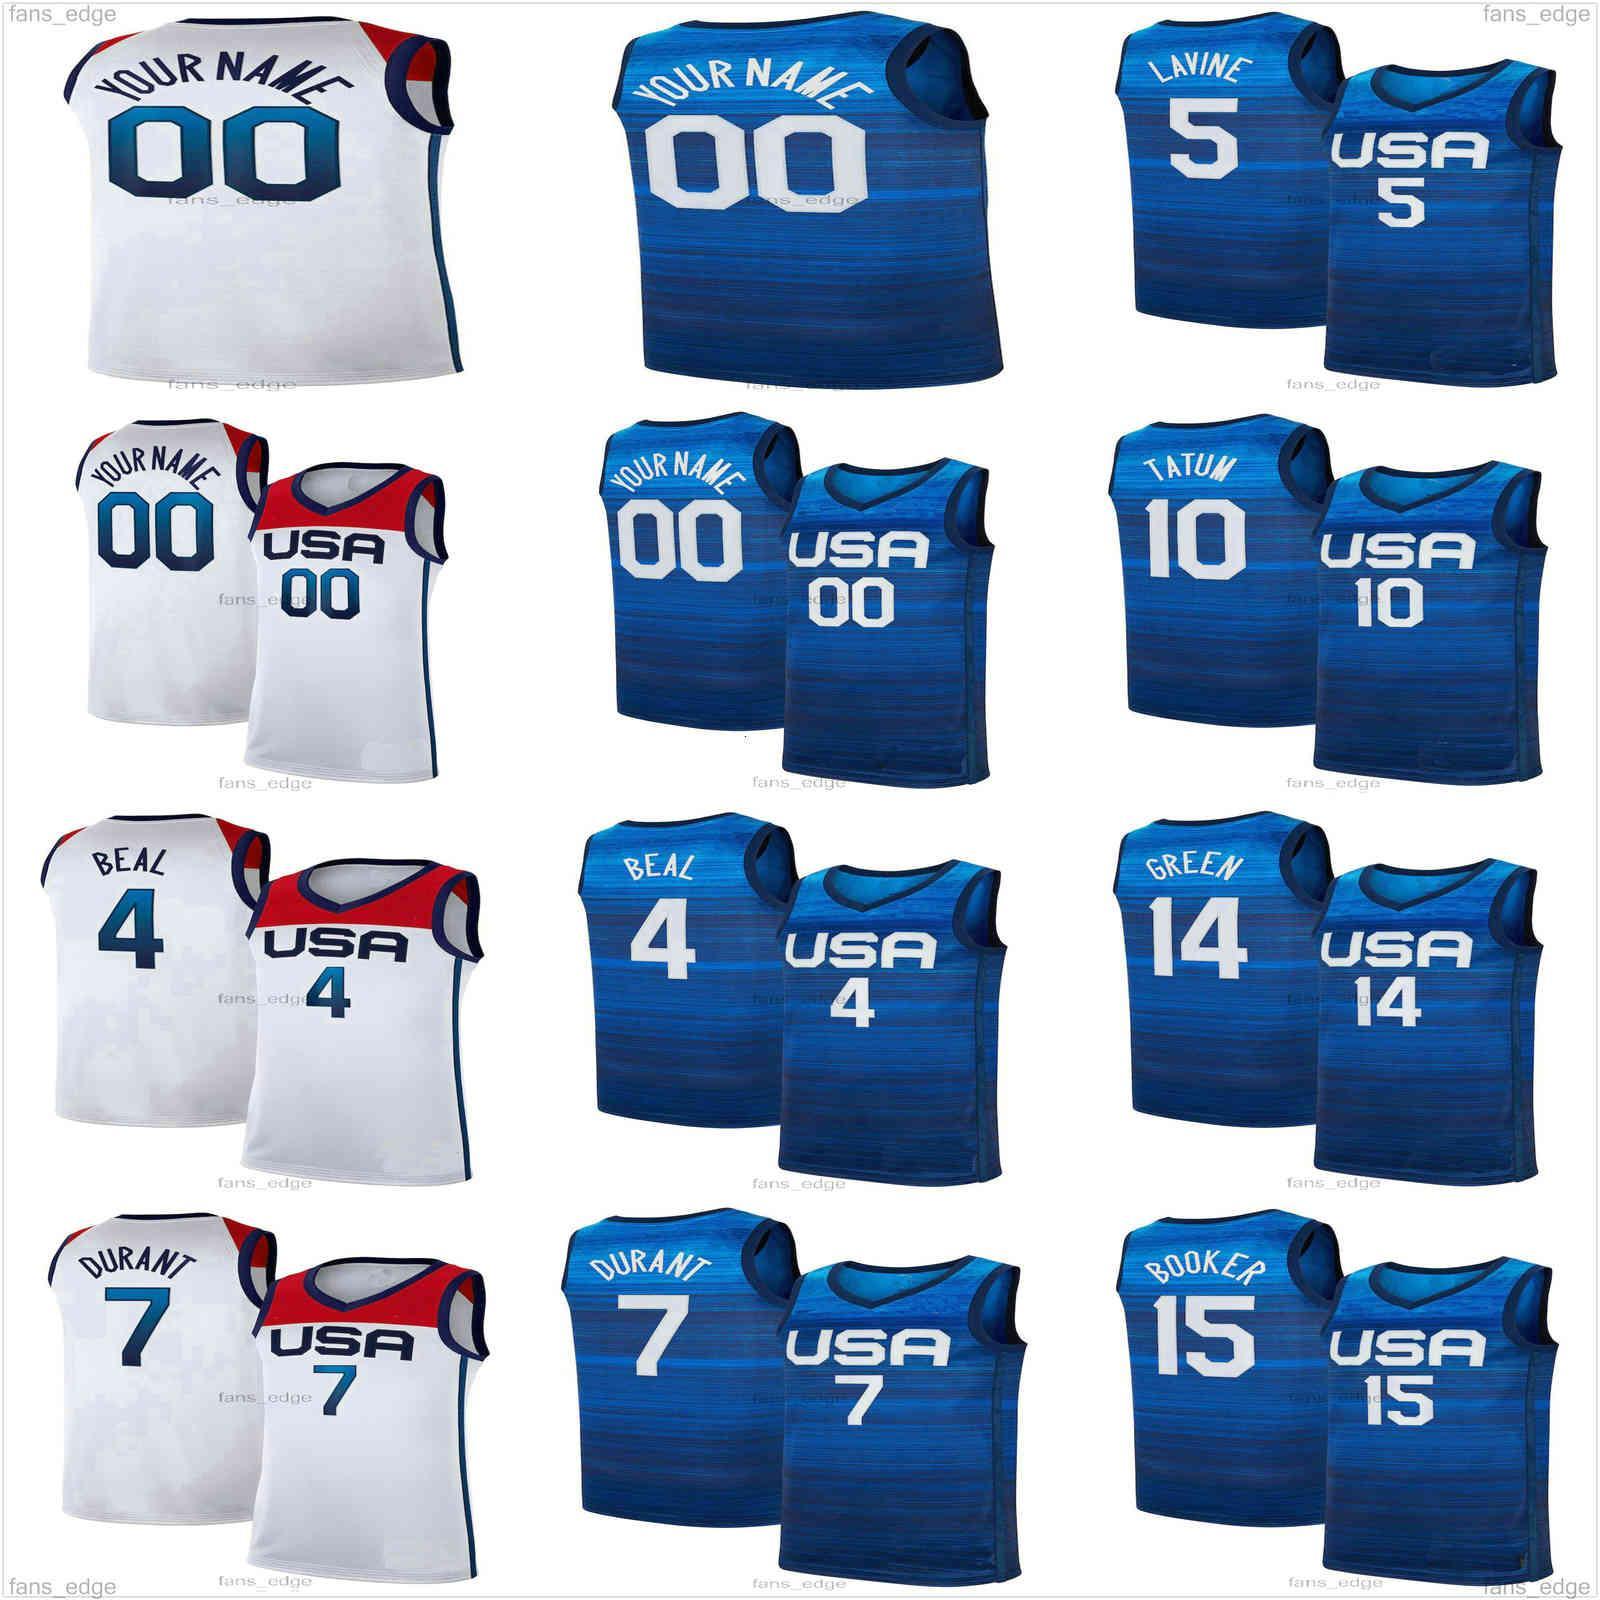 2021 Tokyo Summer Olympics Basketball Jerseys Kevin 7 Durant Devin 15 Booker Damian 6 Lillard Jayson 10 Tatum Zach 5 LaVine Bradley 4 Beal